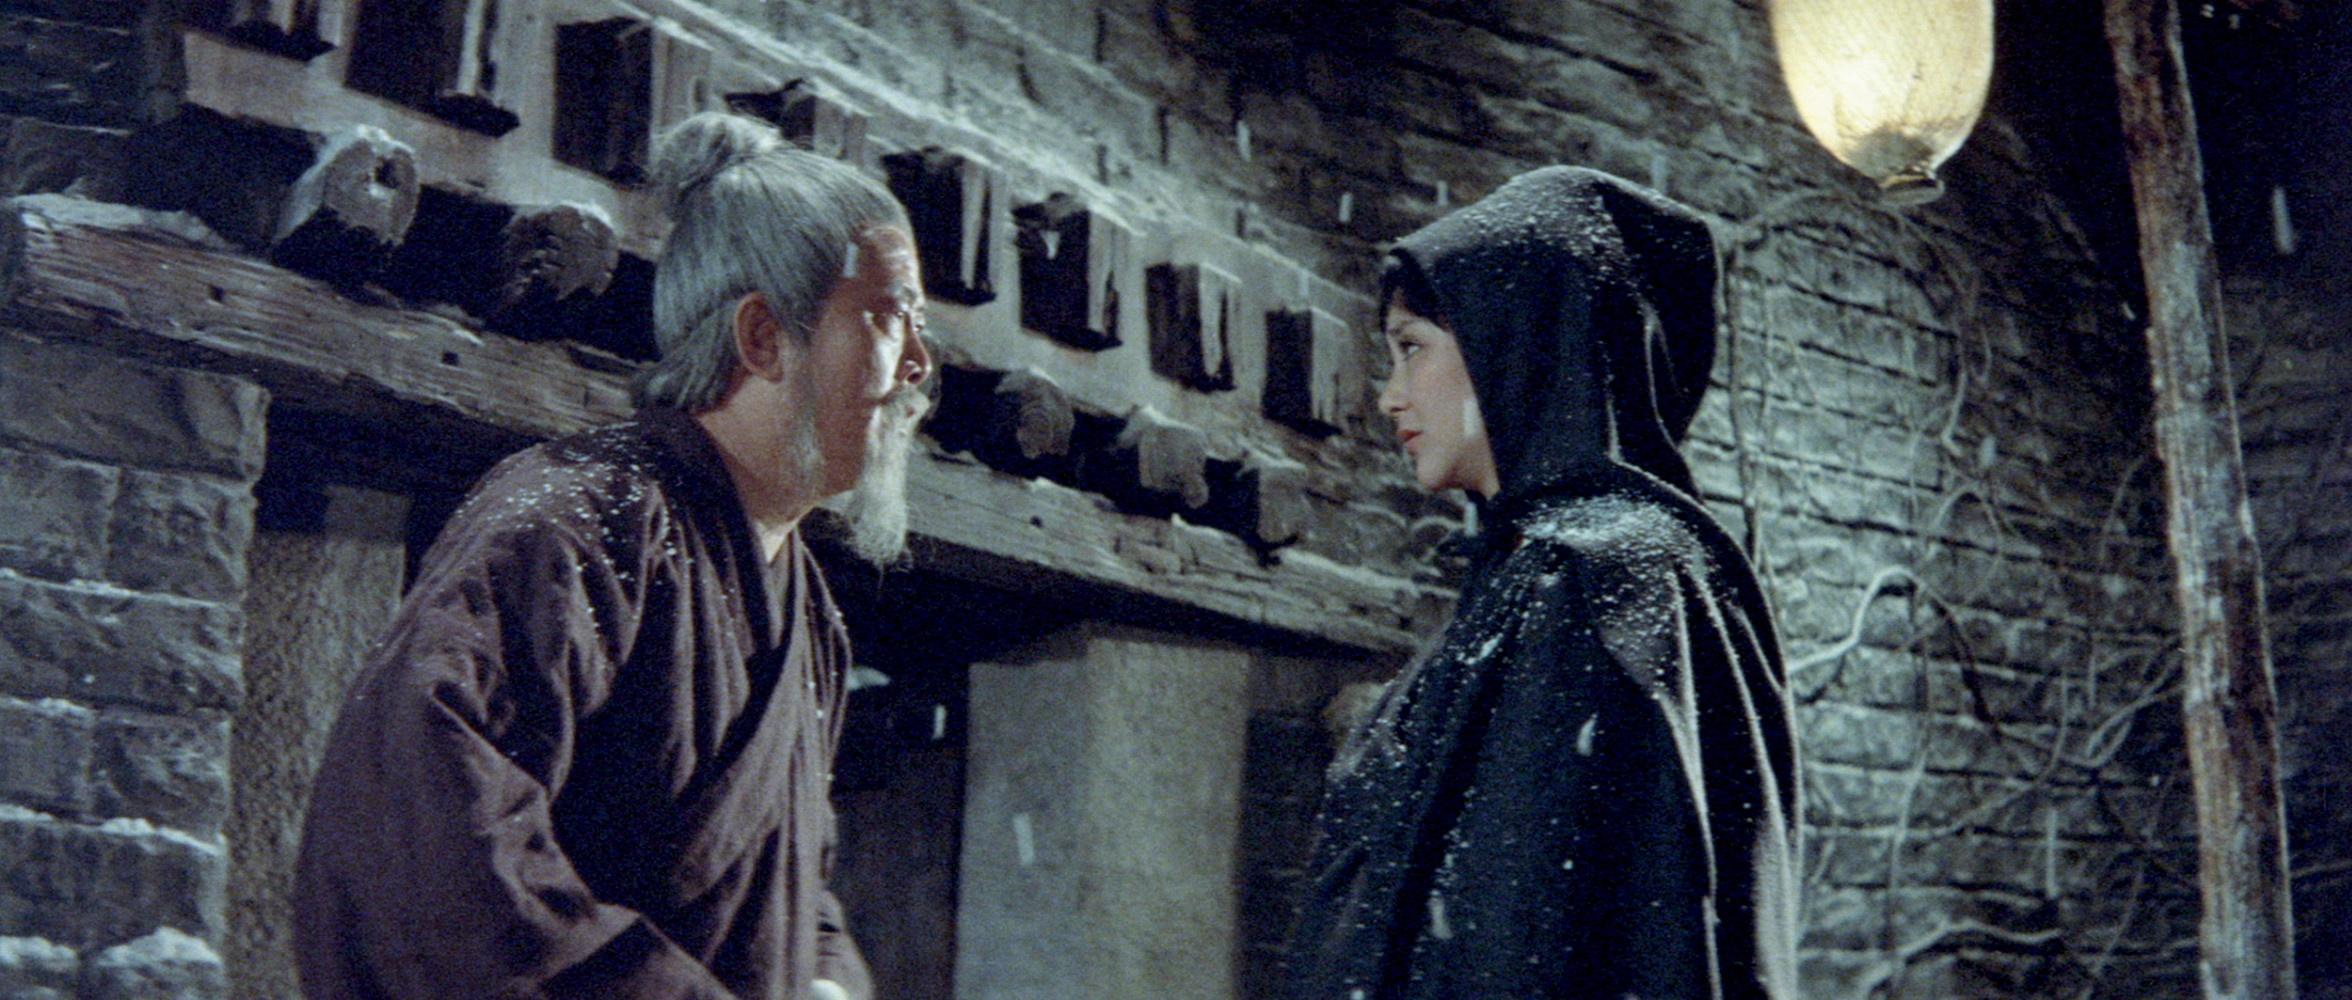 Execution in Autumn recensione film di Lee Hsing